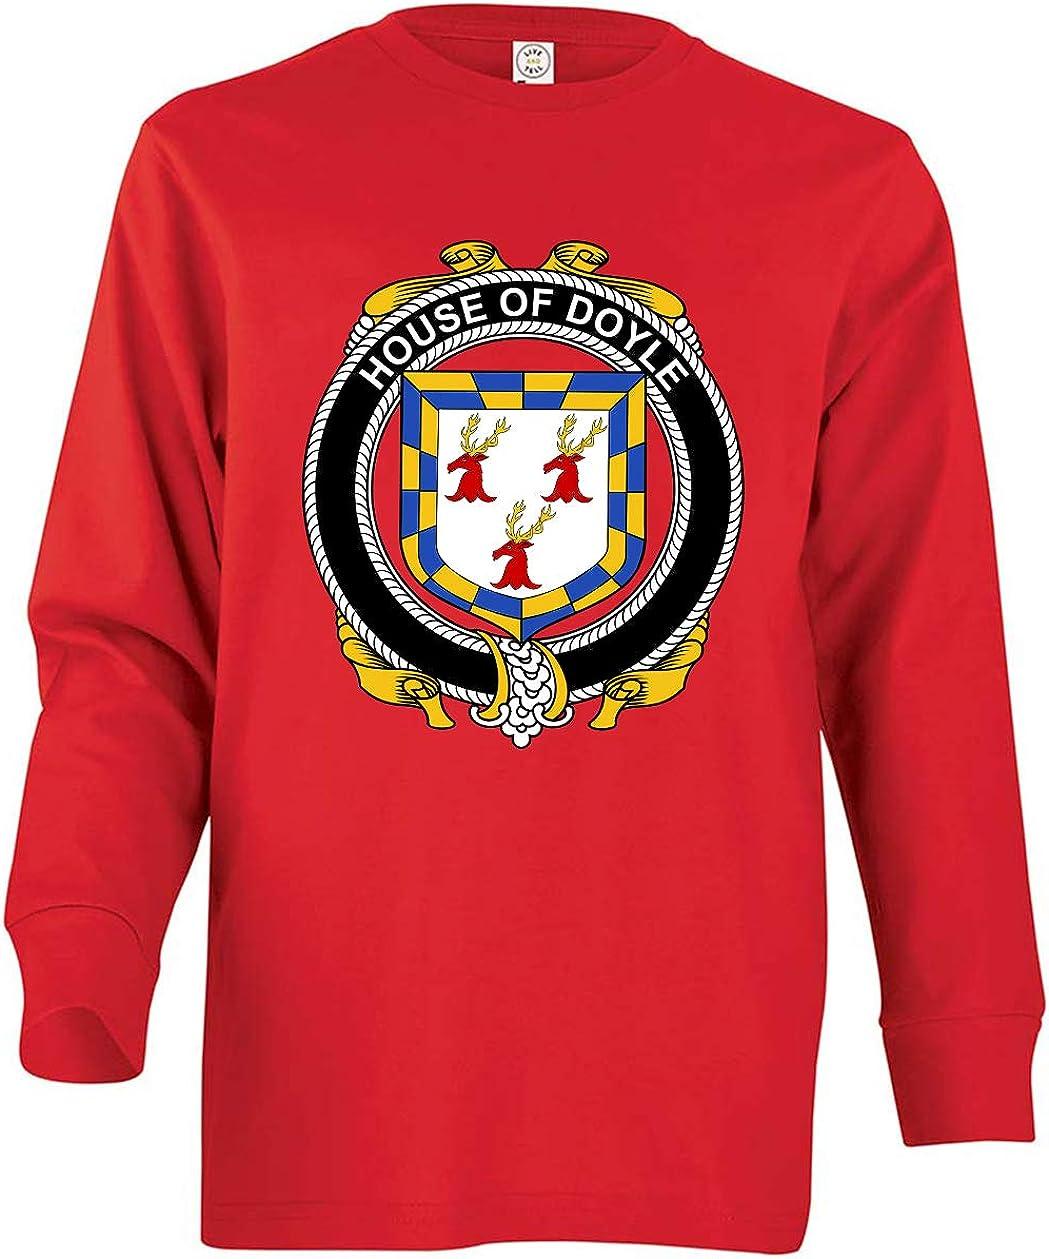 Tenacitee Boys Youth Irish House Heraldry Doyle T-Shirt